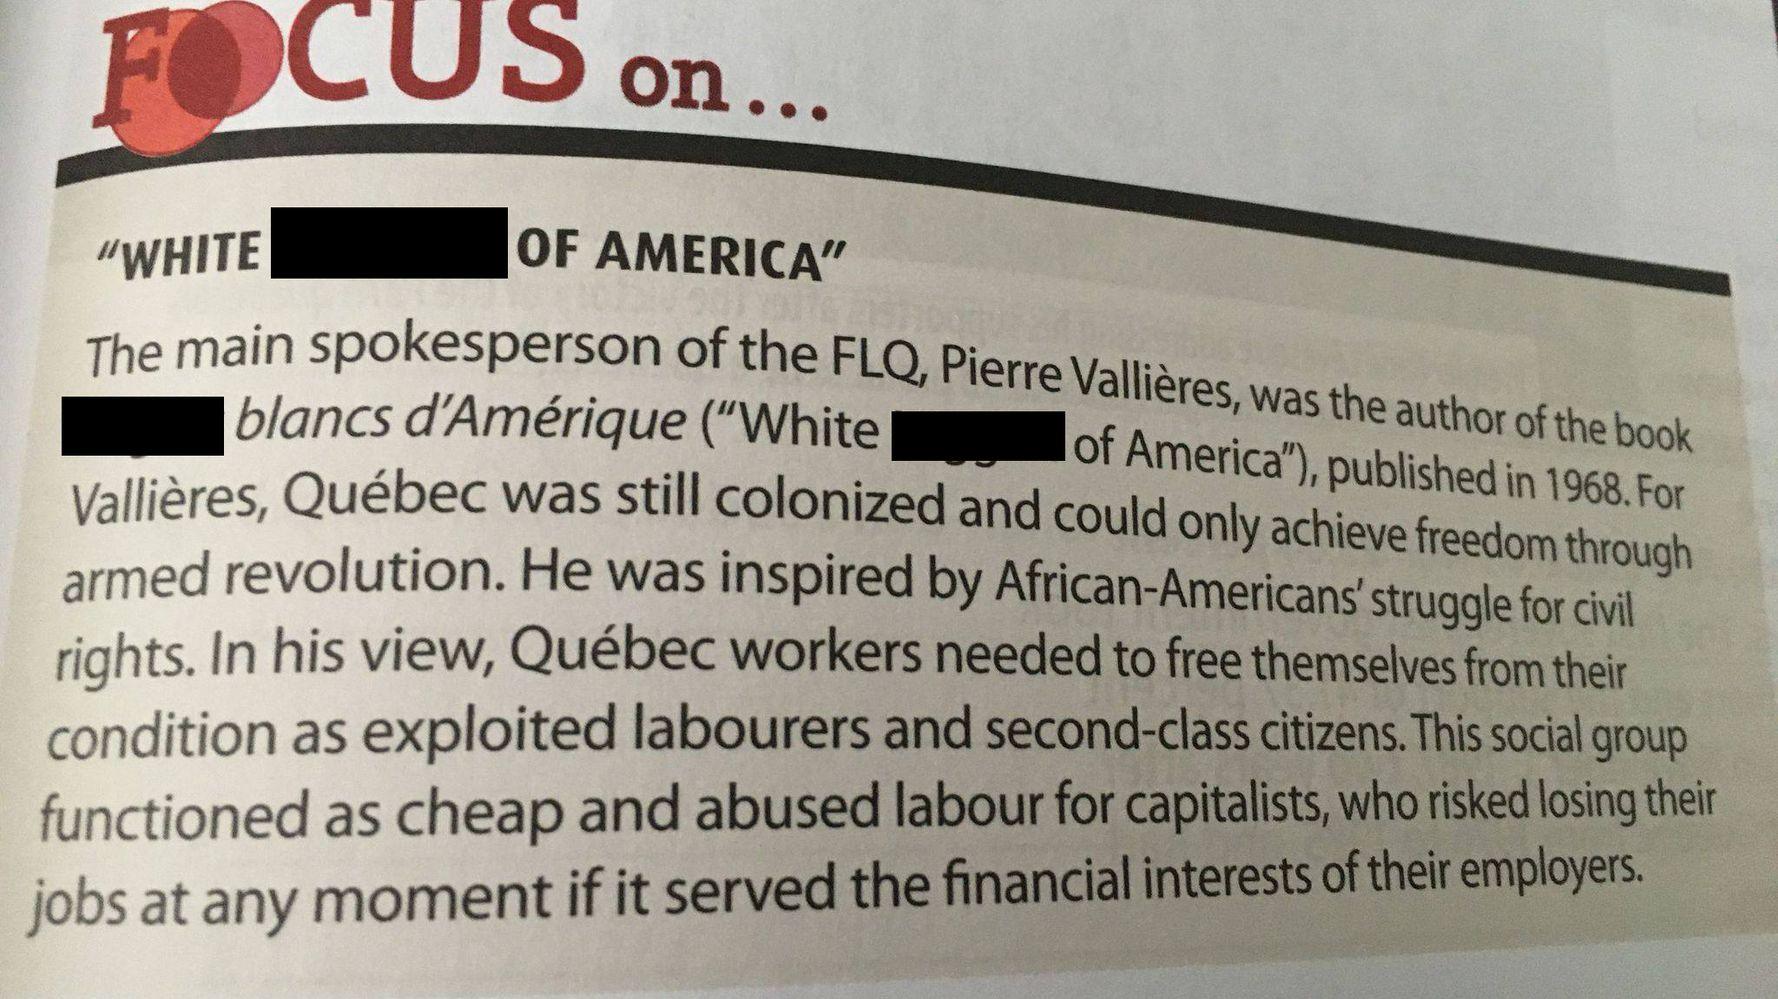 Montreal Teacher Shocked To Find N-Word In High School Textbook